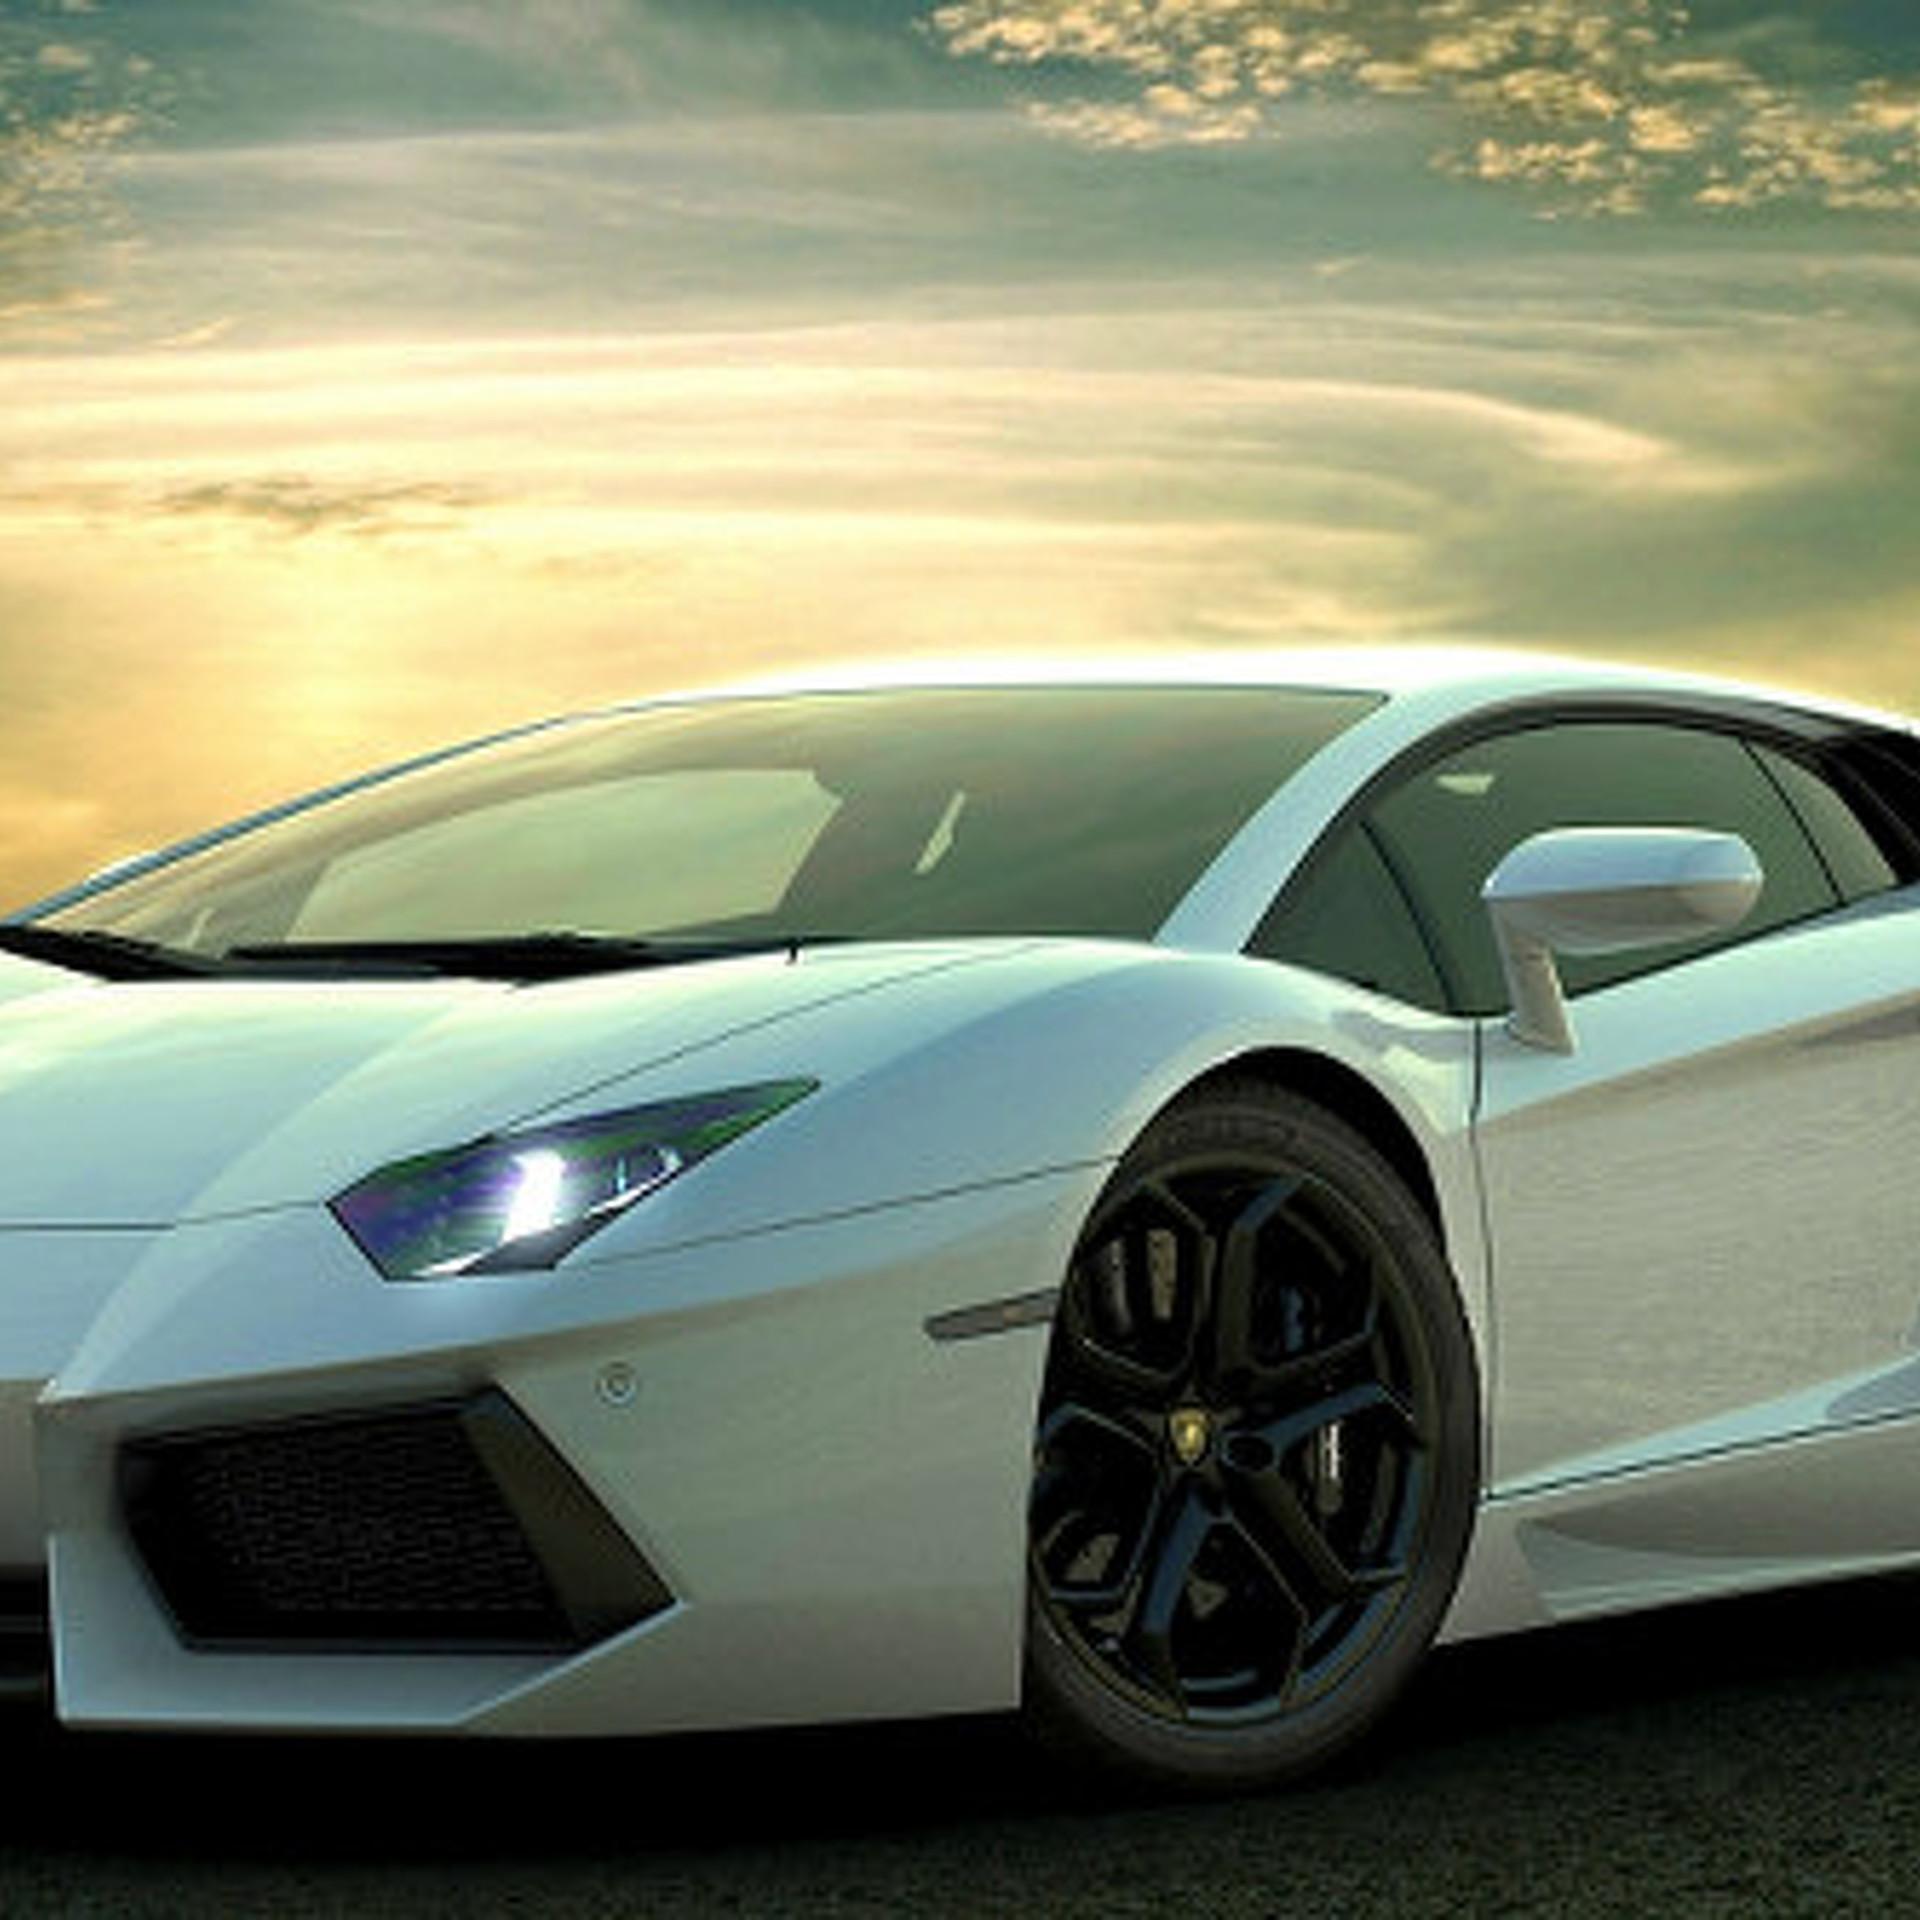 A Time-Traveling Lamborghini in 'Dallas Buyers Club'?